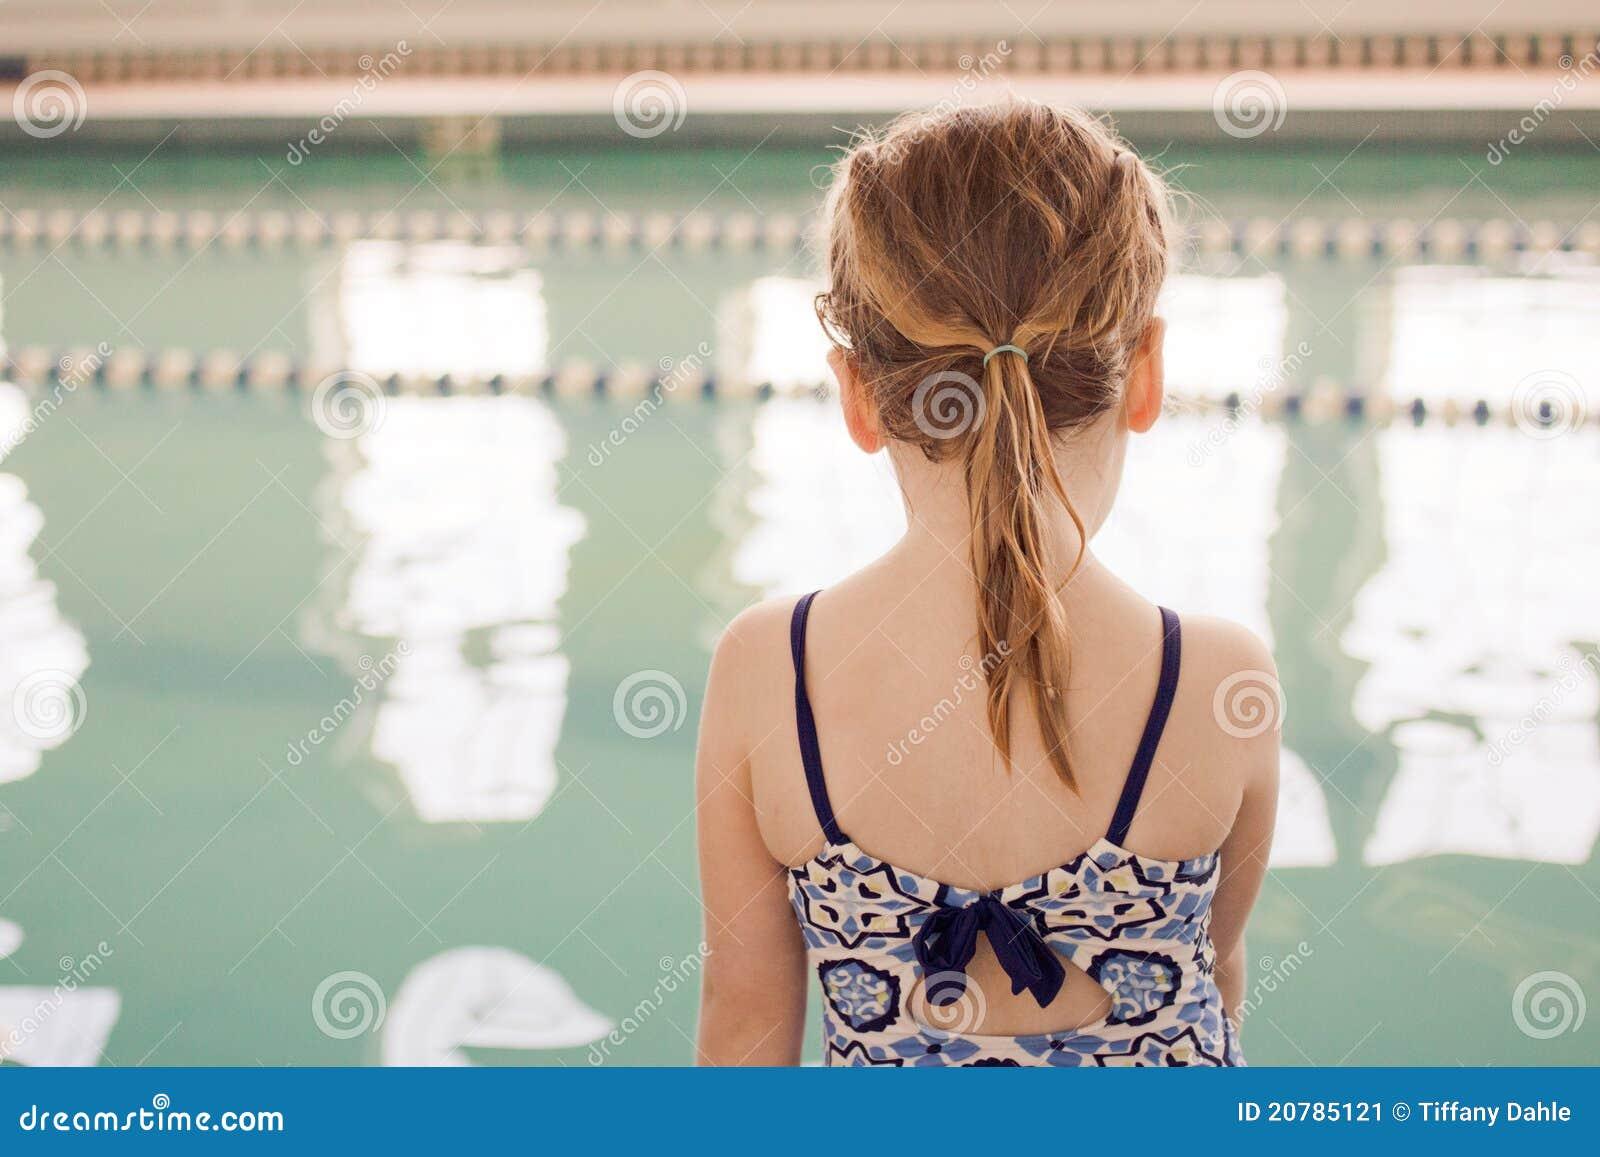 Girl at swim class